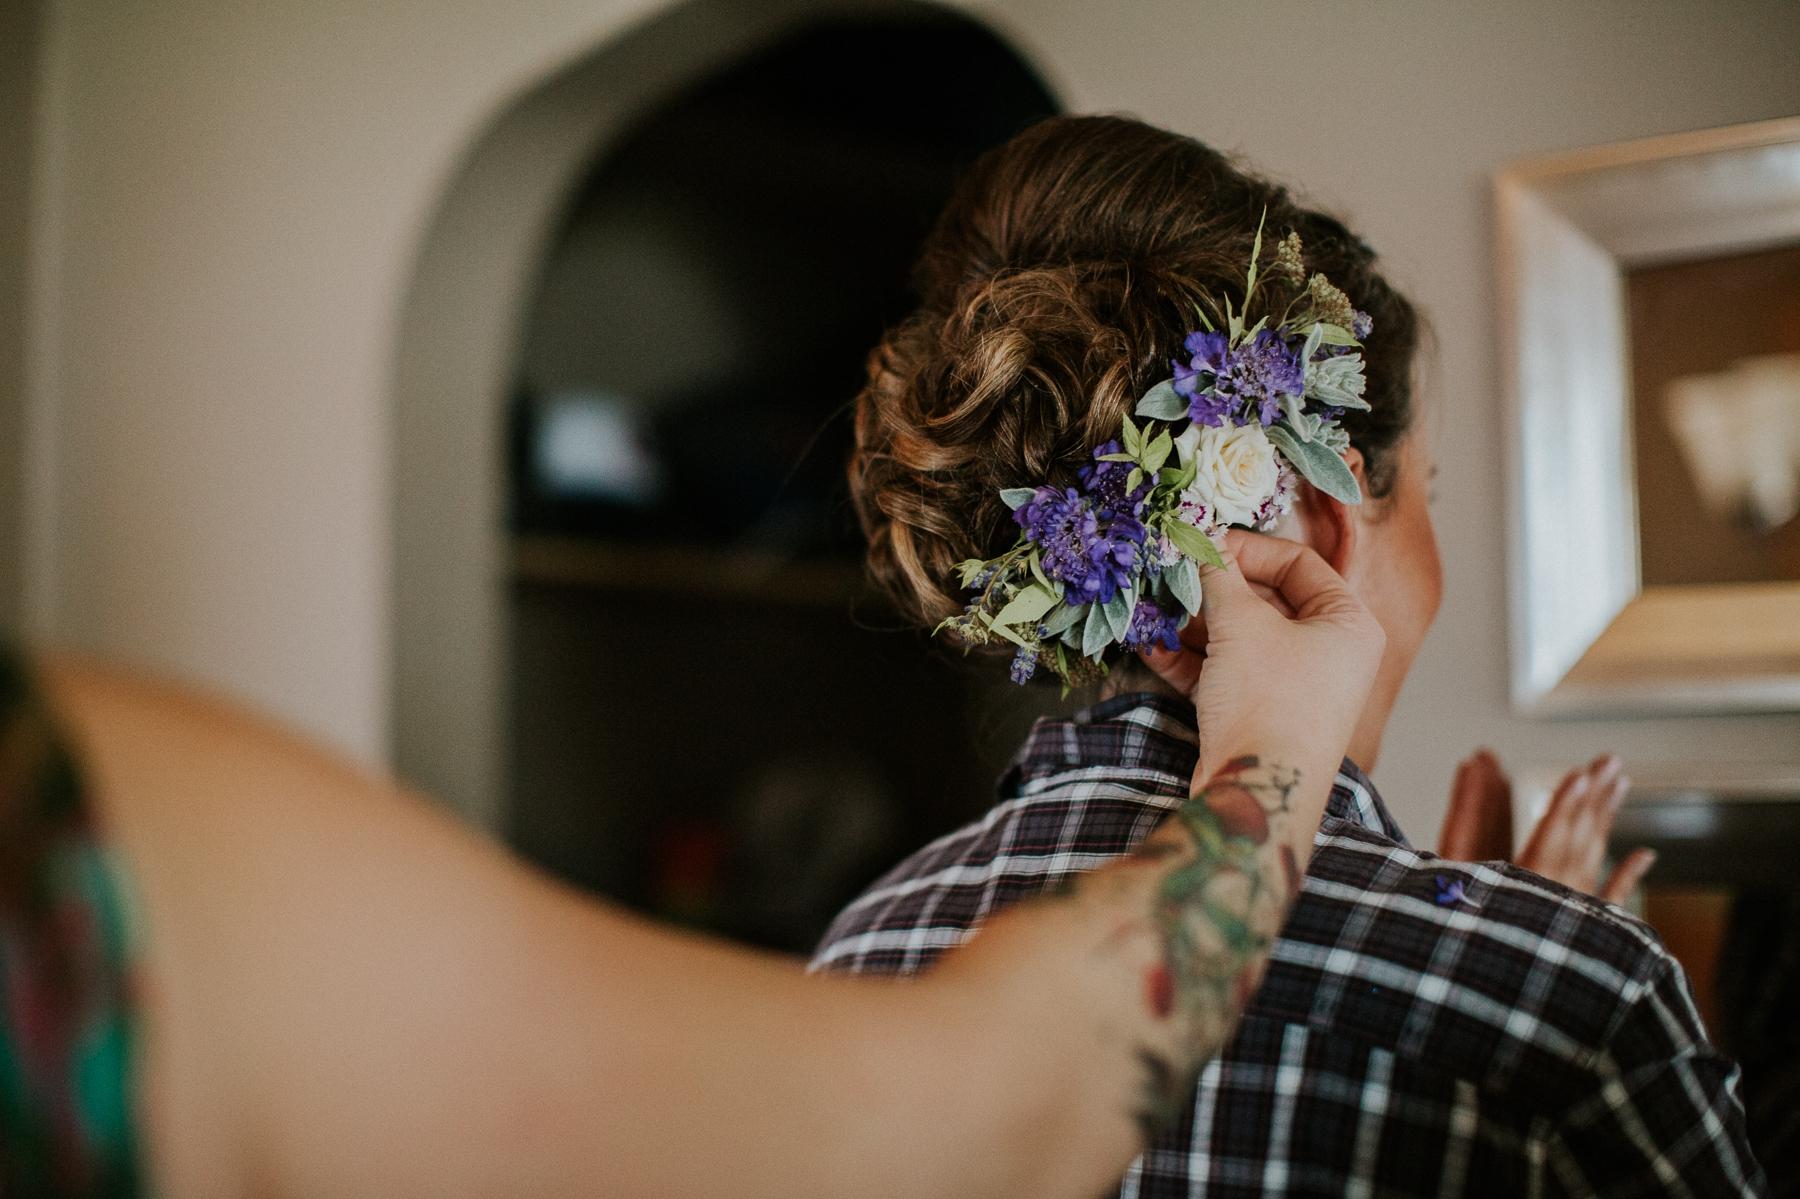 buffalo-new-york-hamburg-beach-wedding-photography 6.jpg